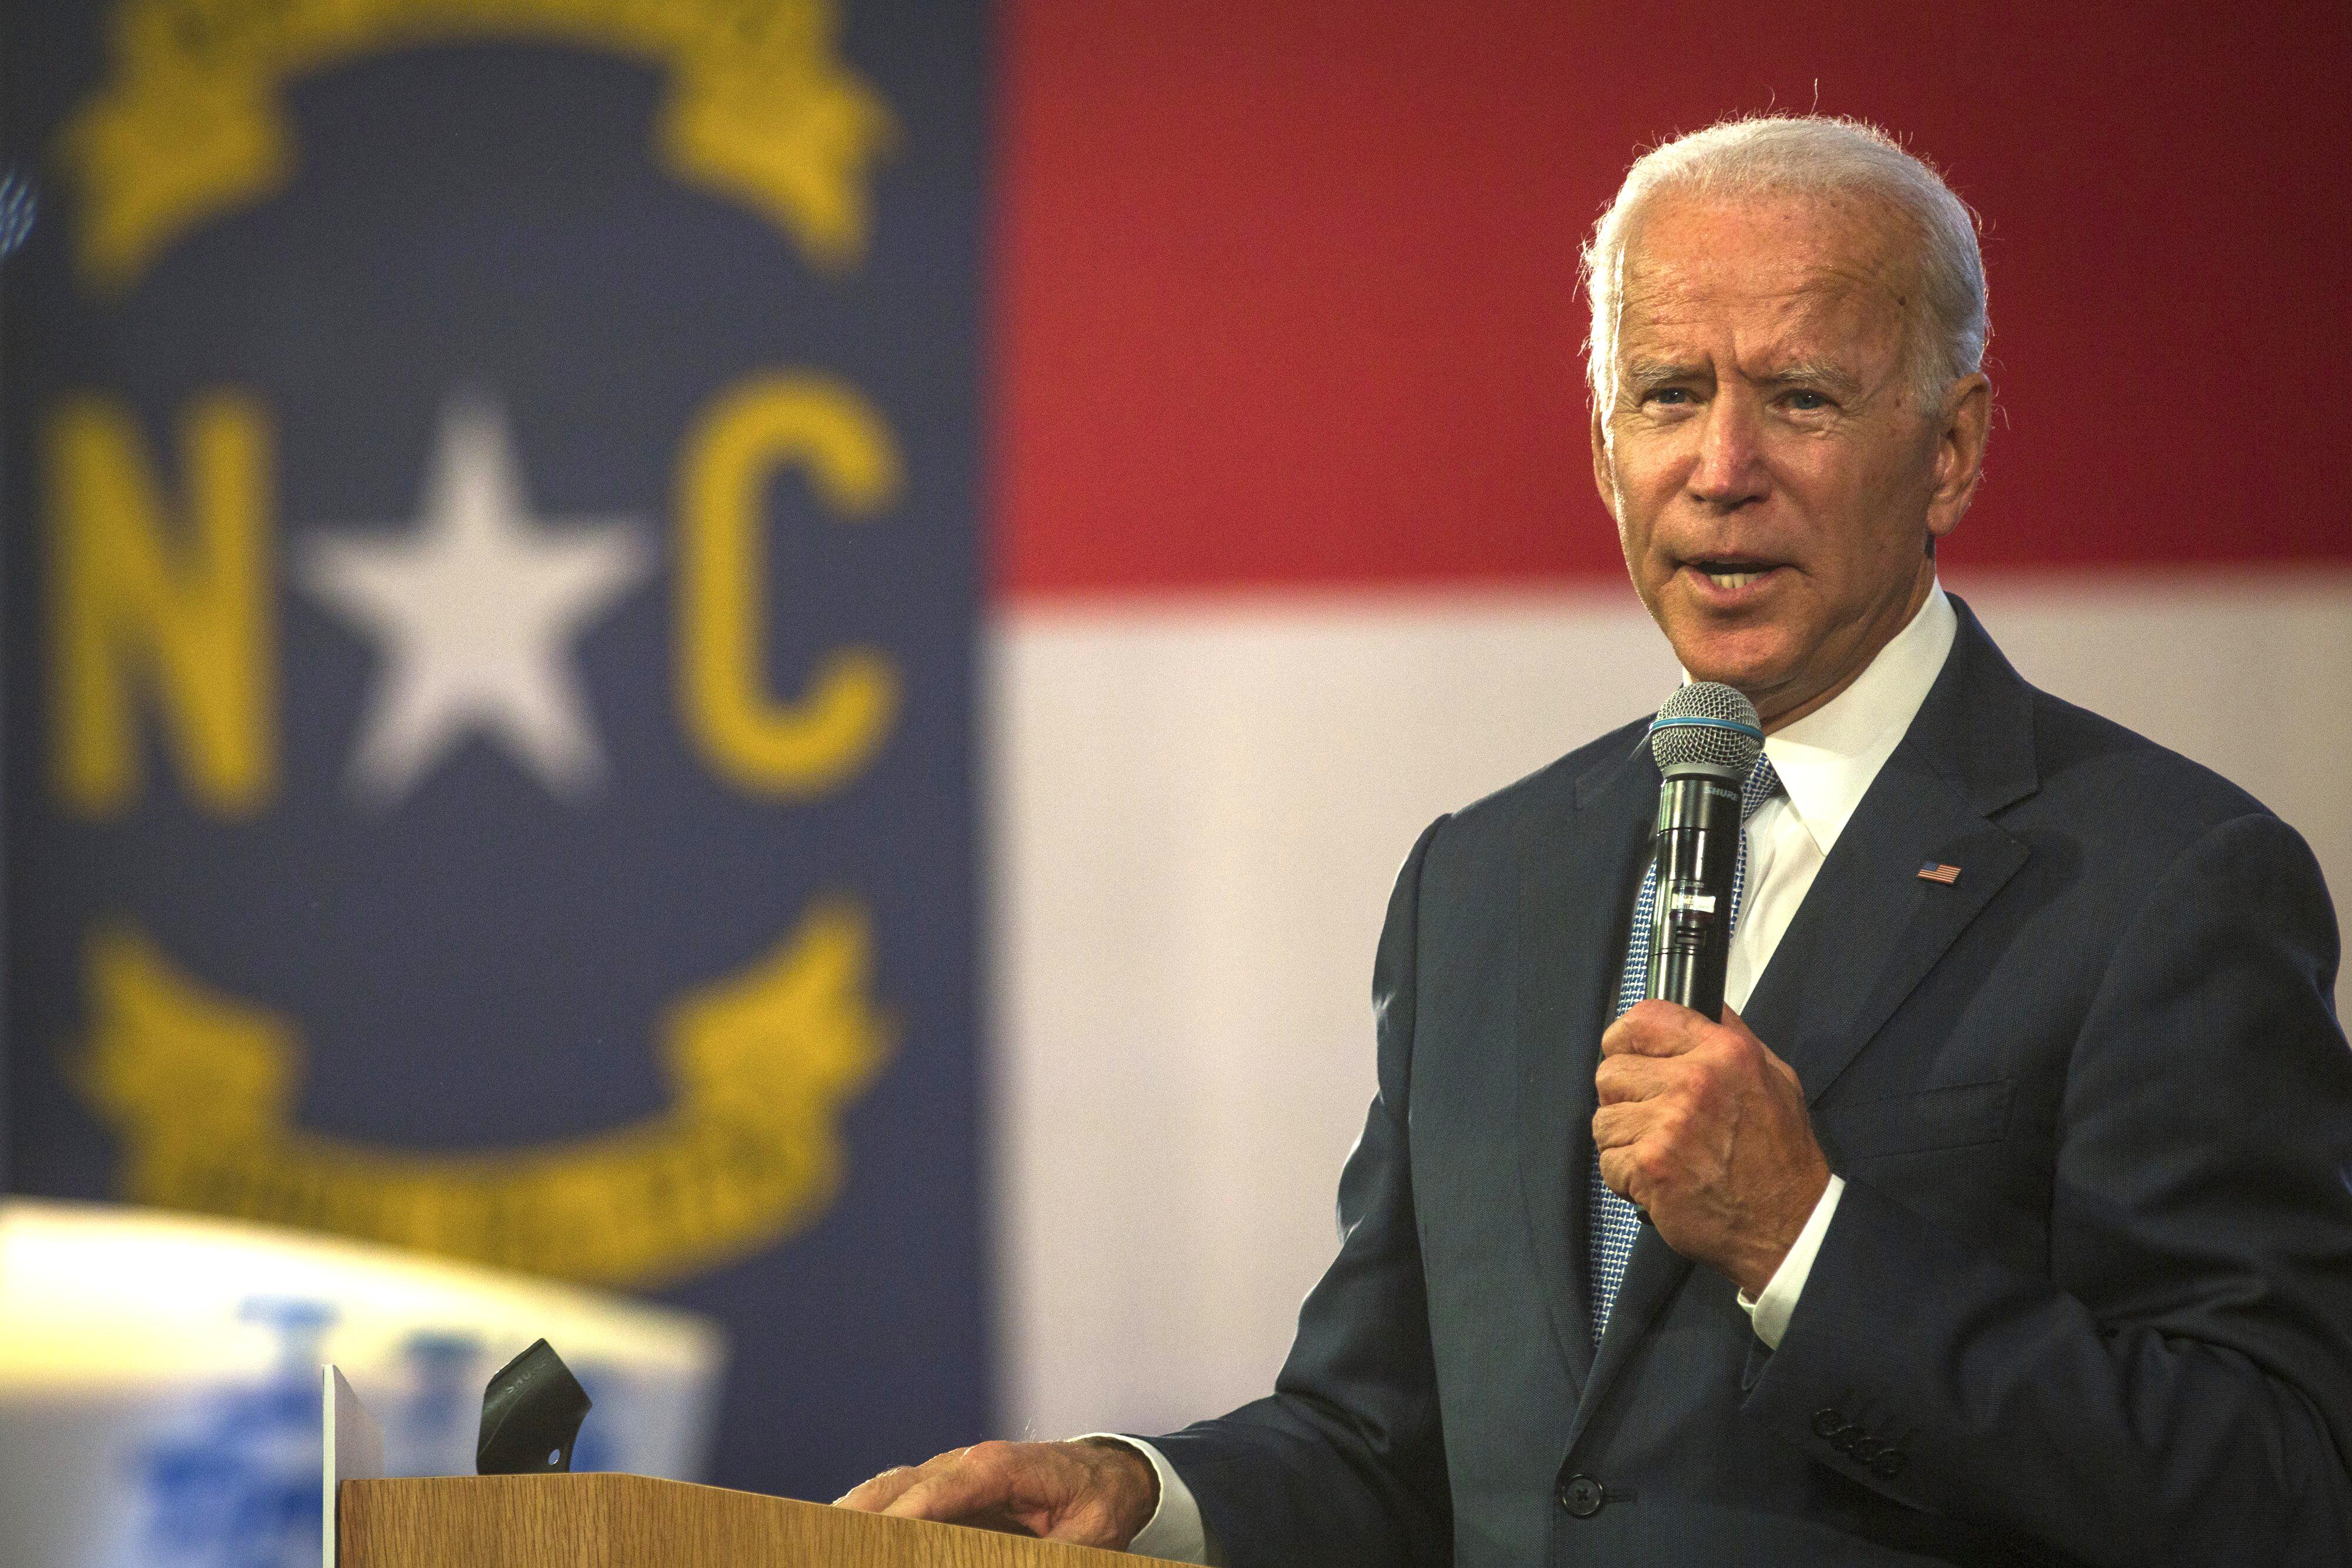 Biden: Kushner has no credentials for White House post